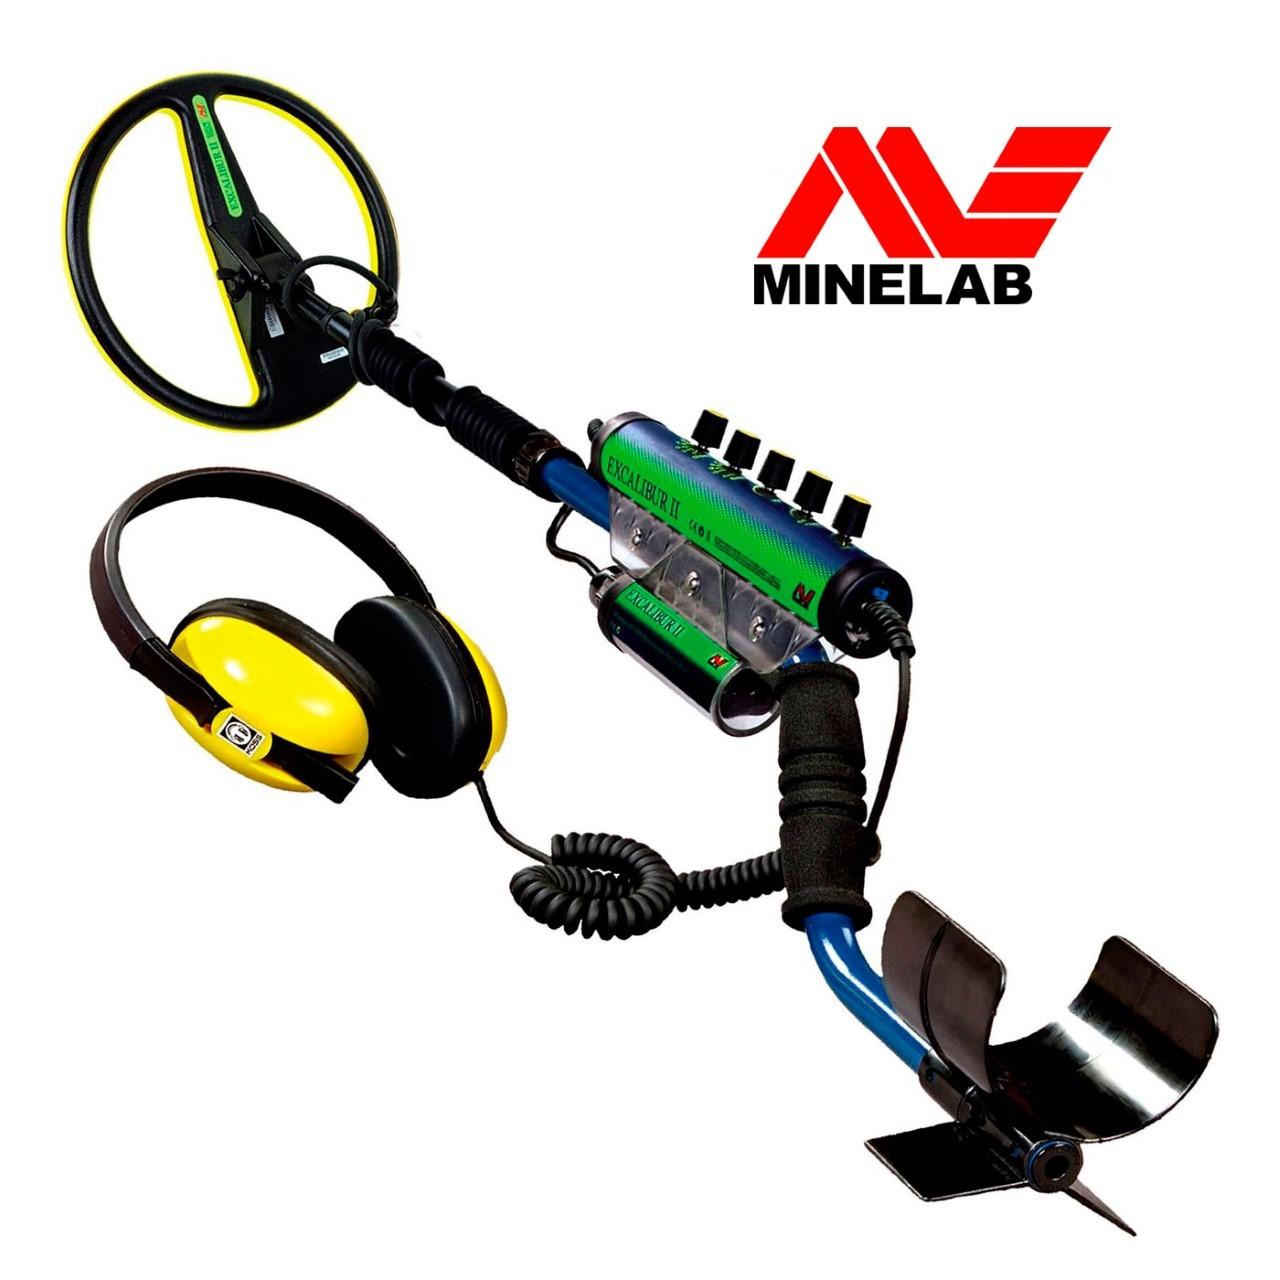 Minelab Excalibur II buceo profundo detector de metales